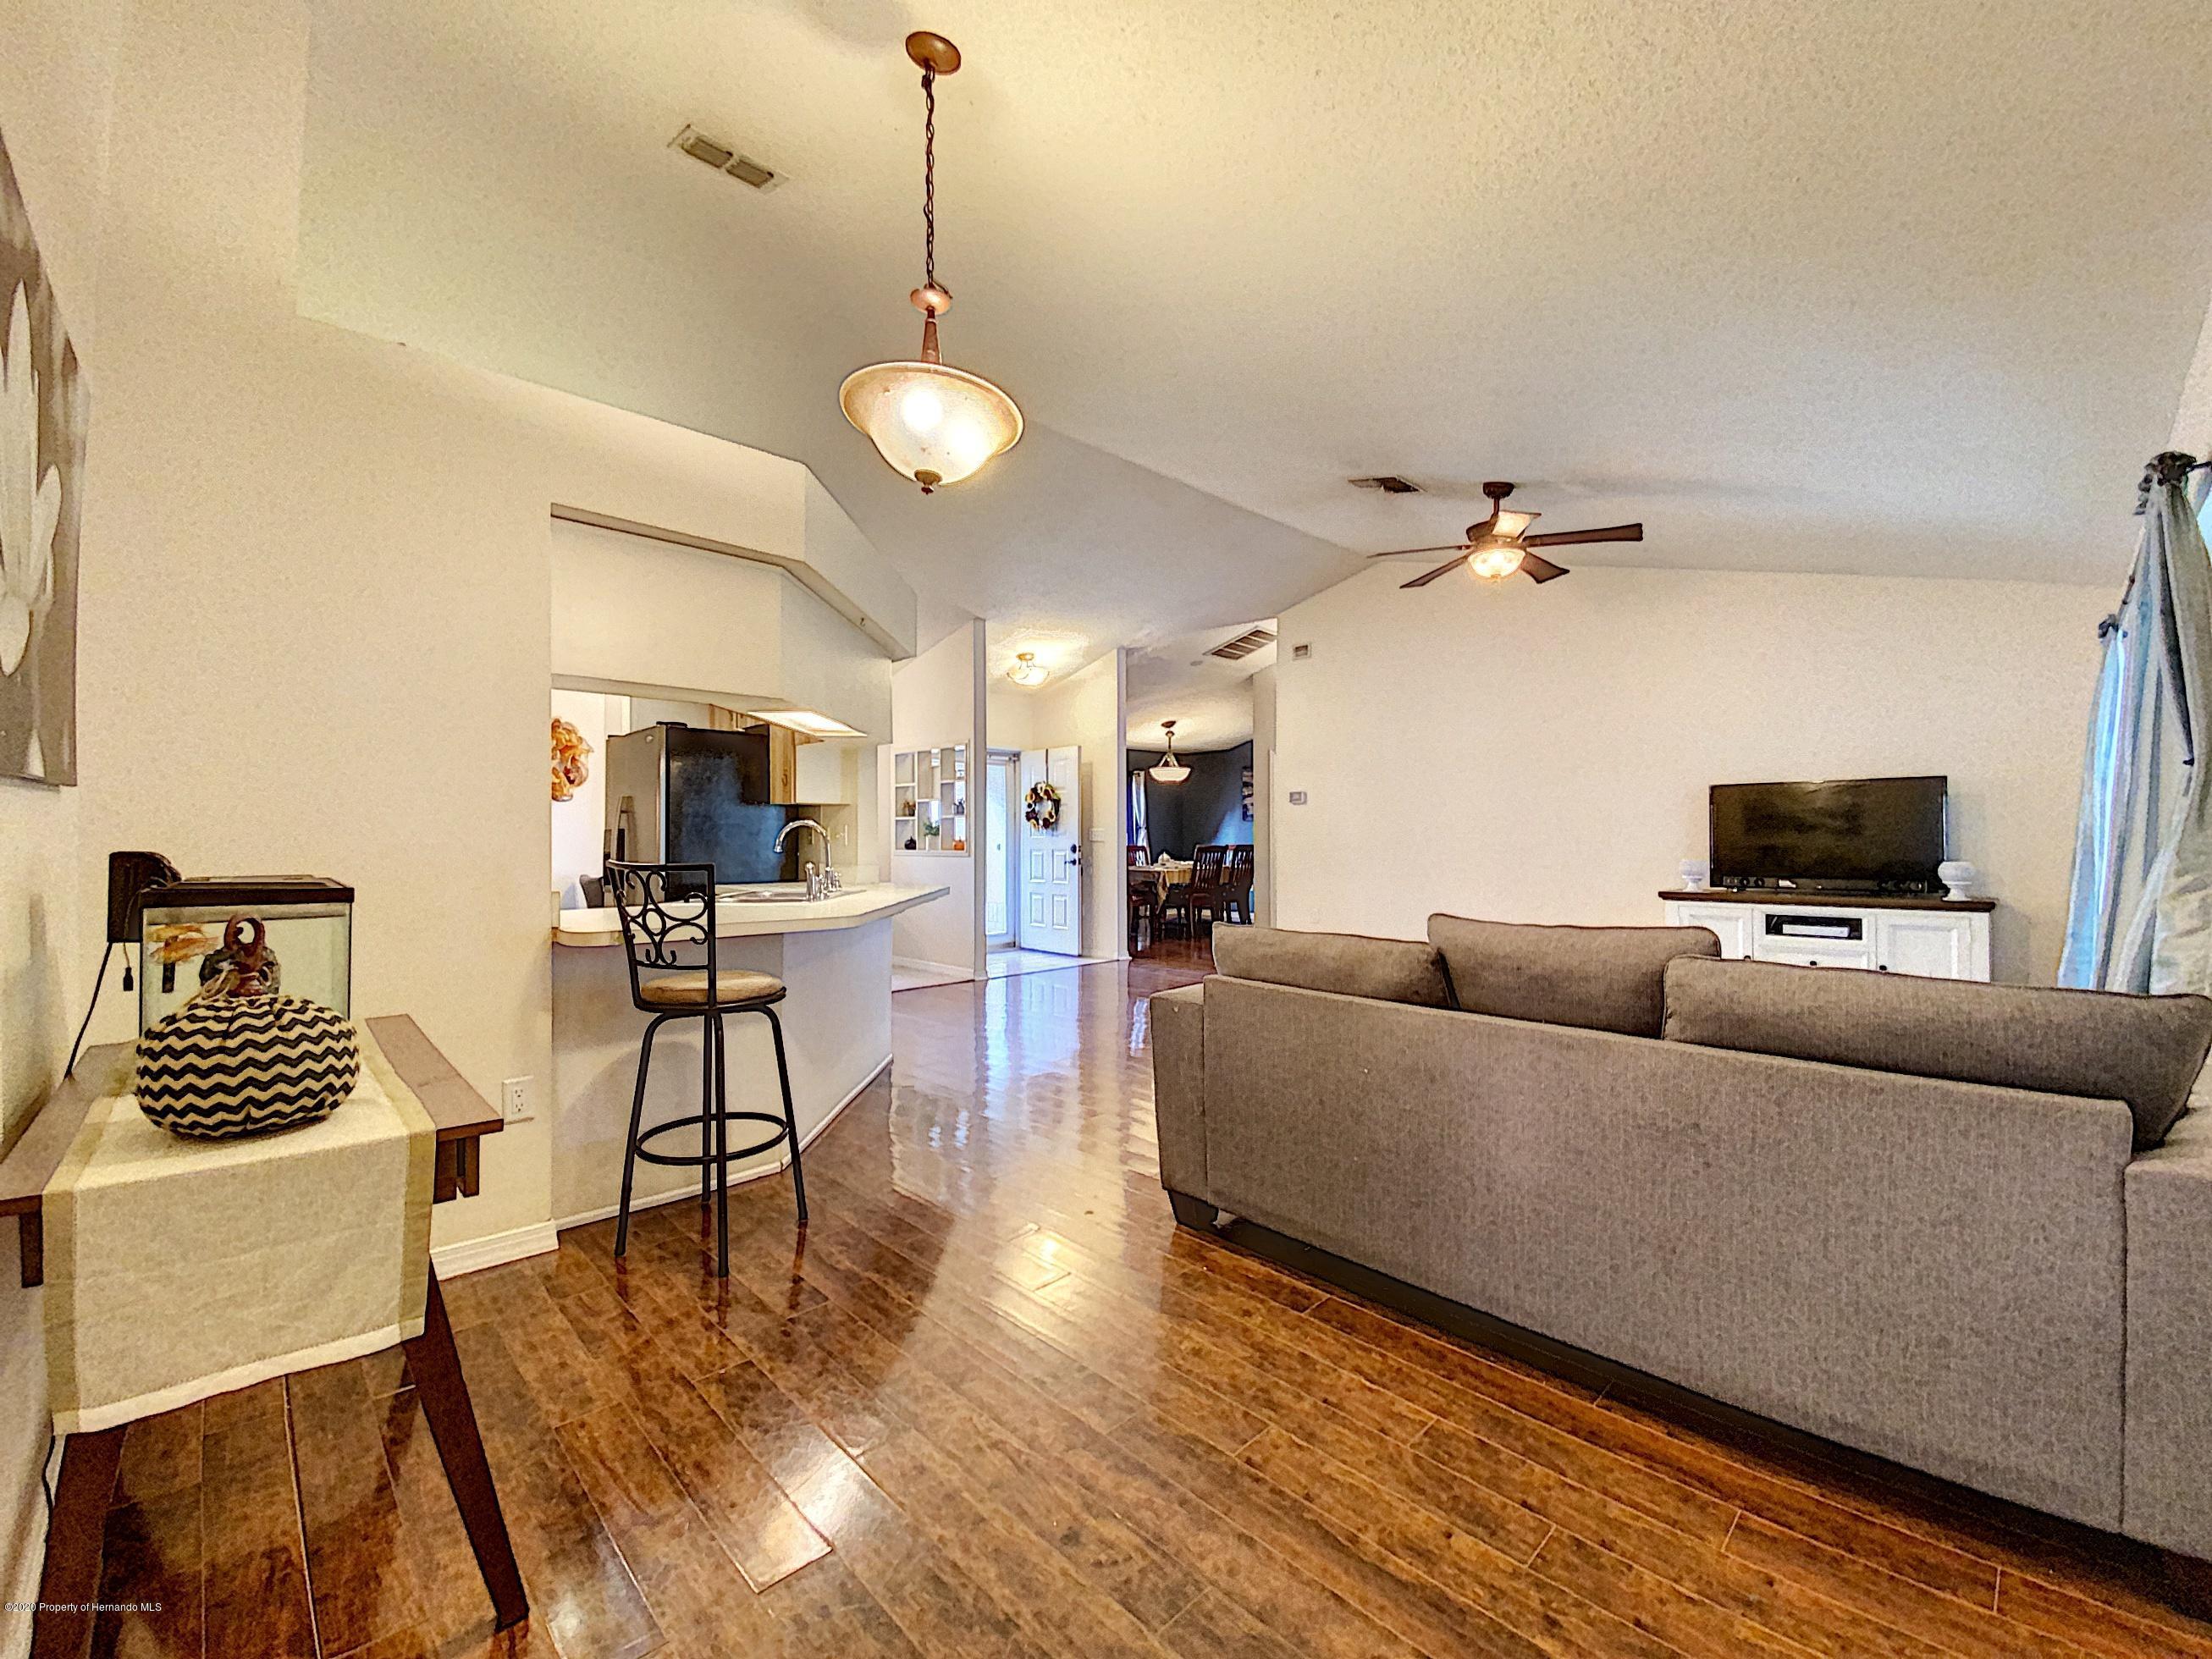 Image 5 For 515 Underwood Avenue